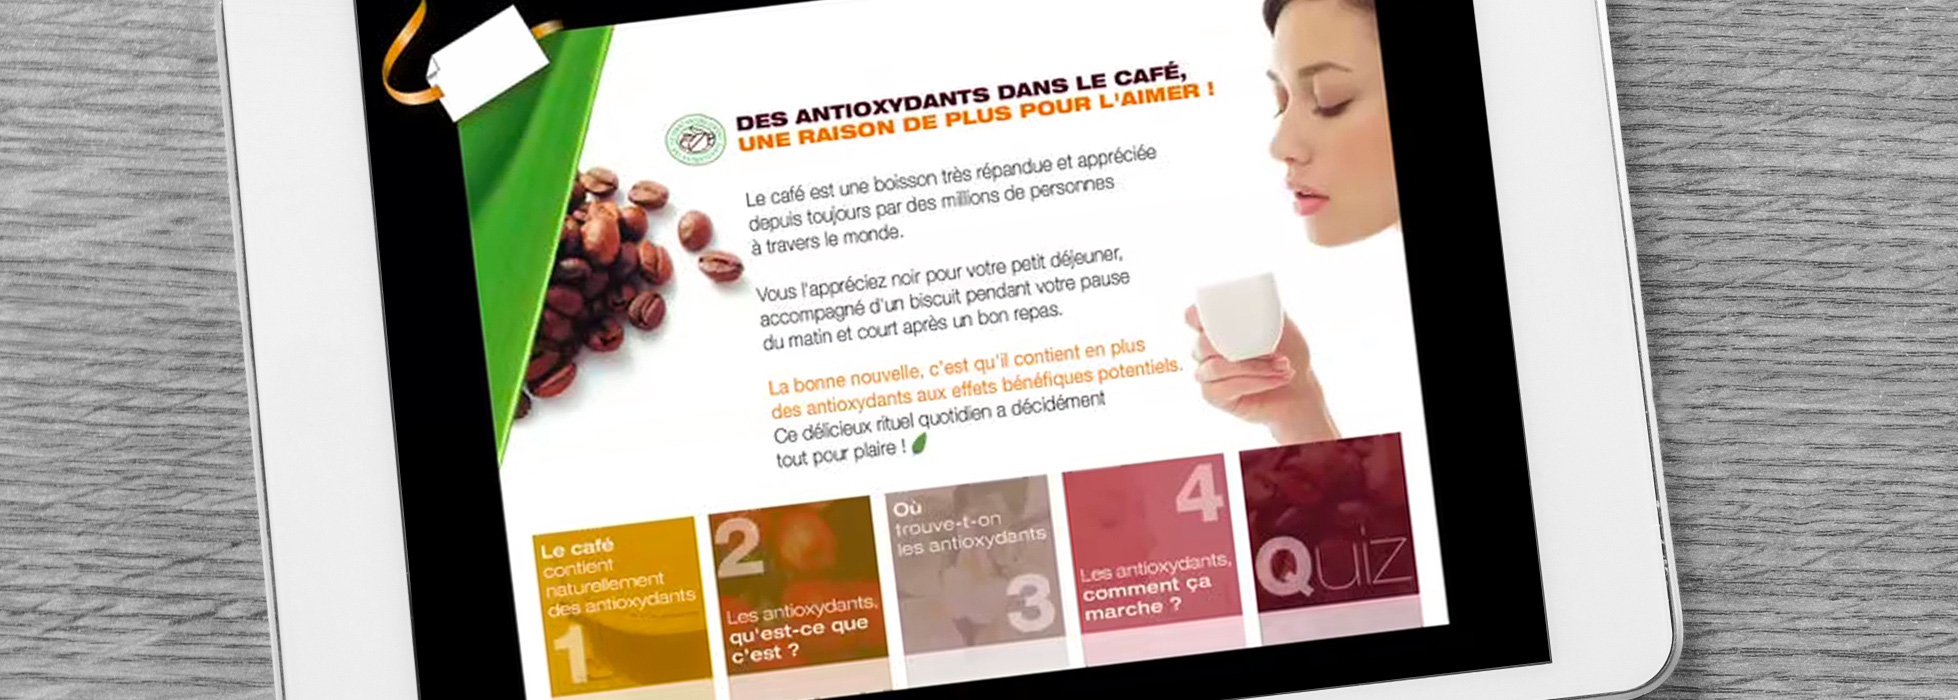 Café &Antioxydants